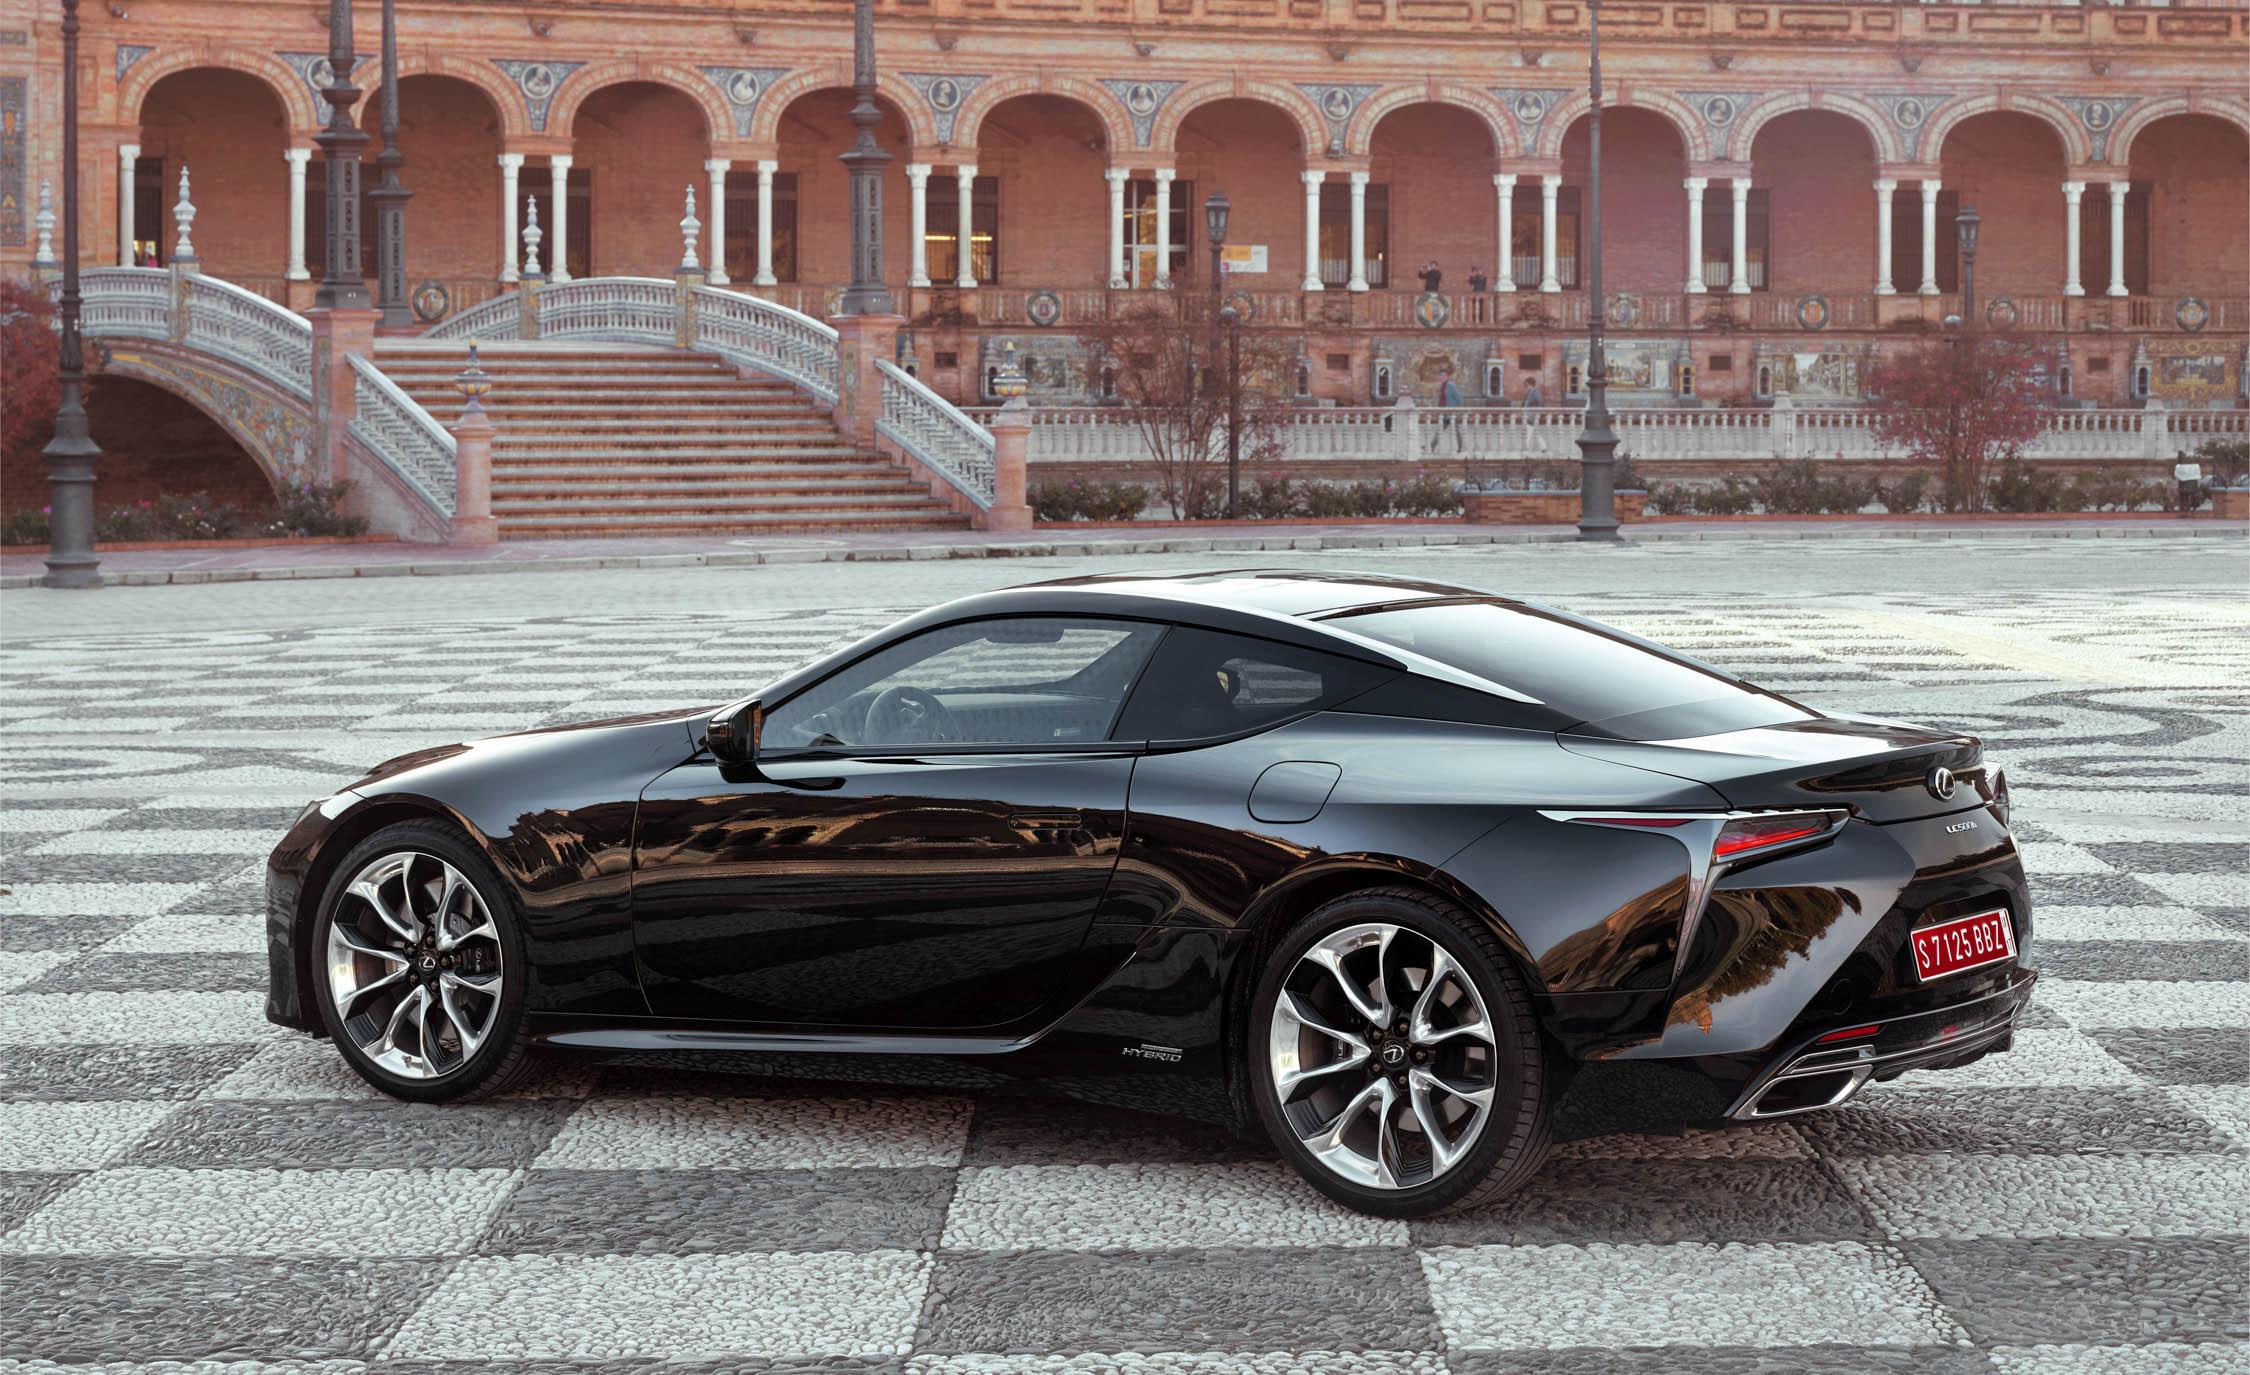 2018 Lexus LC 500 | Cars Exclusive Videos and Photos Updates